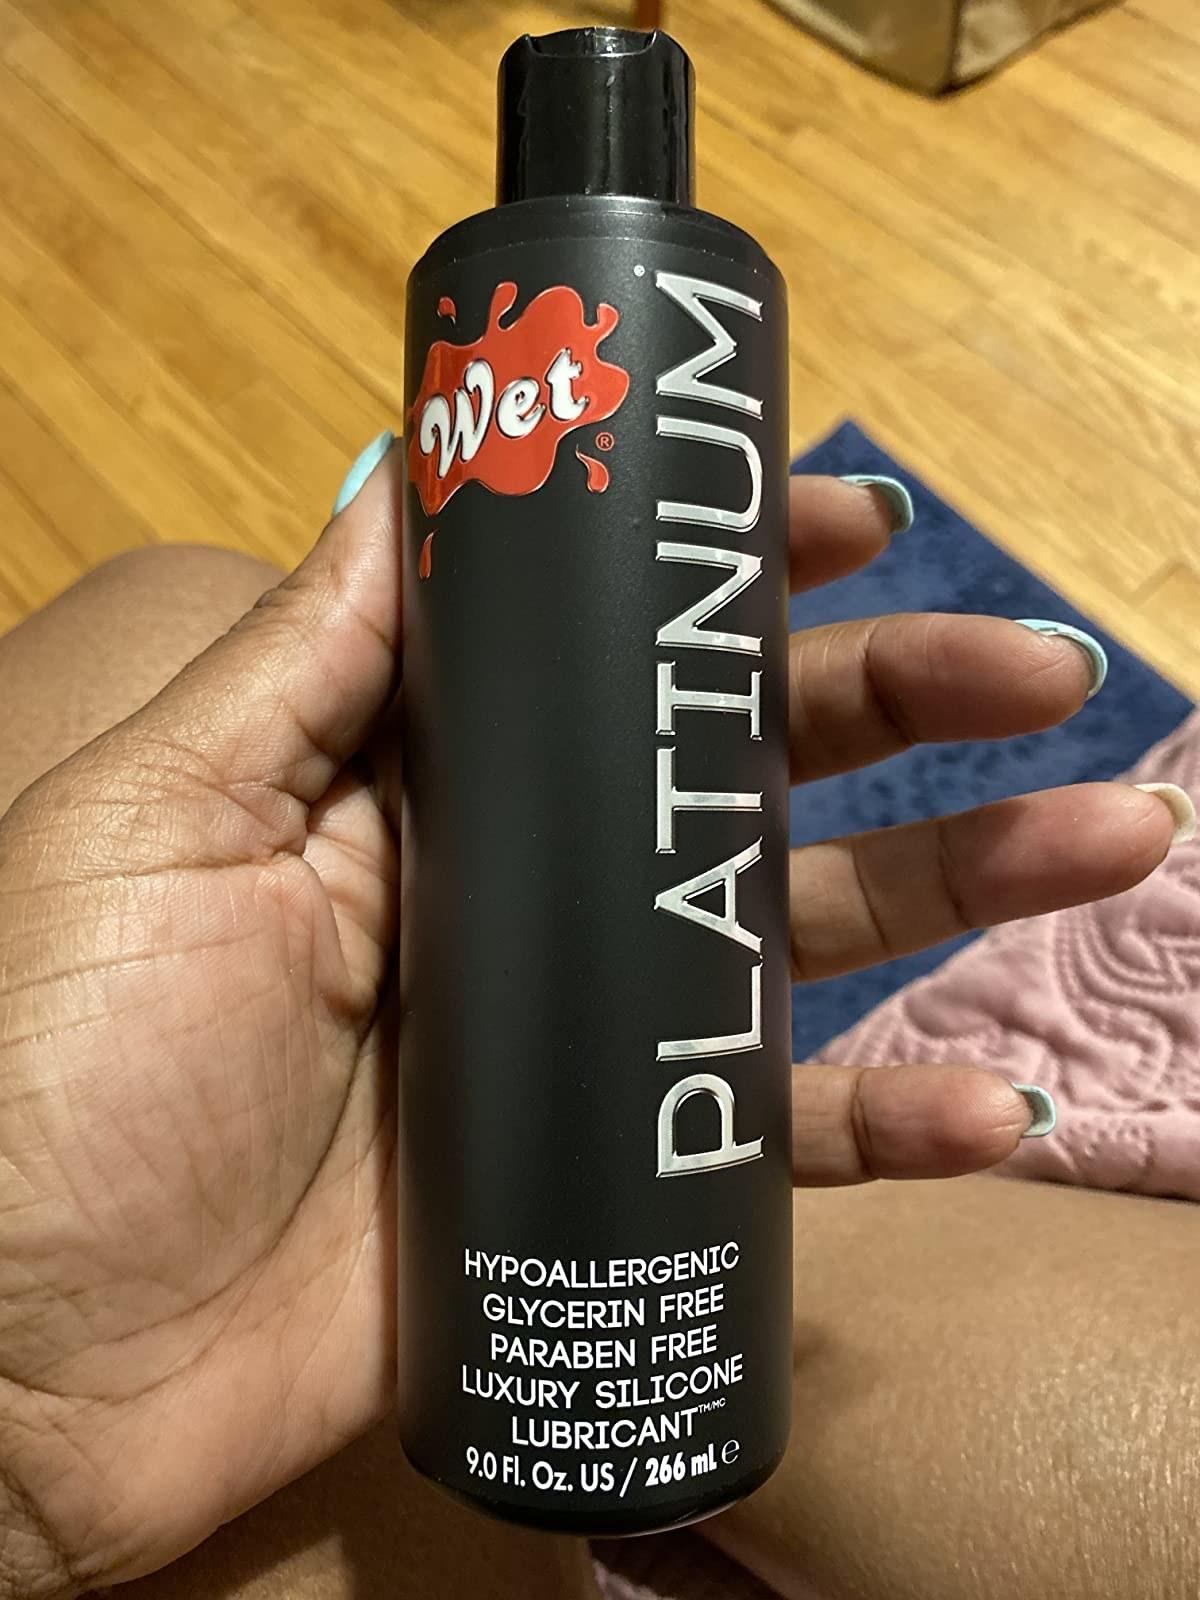 Model holding black bottle of Wet Platinum lubricant